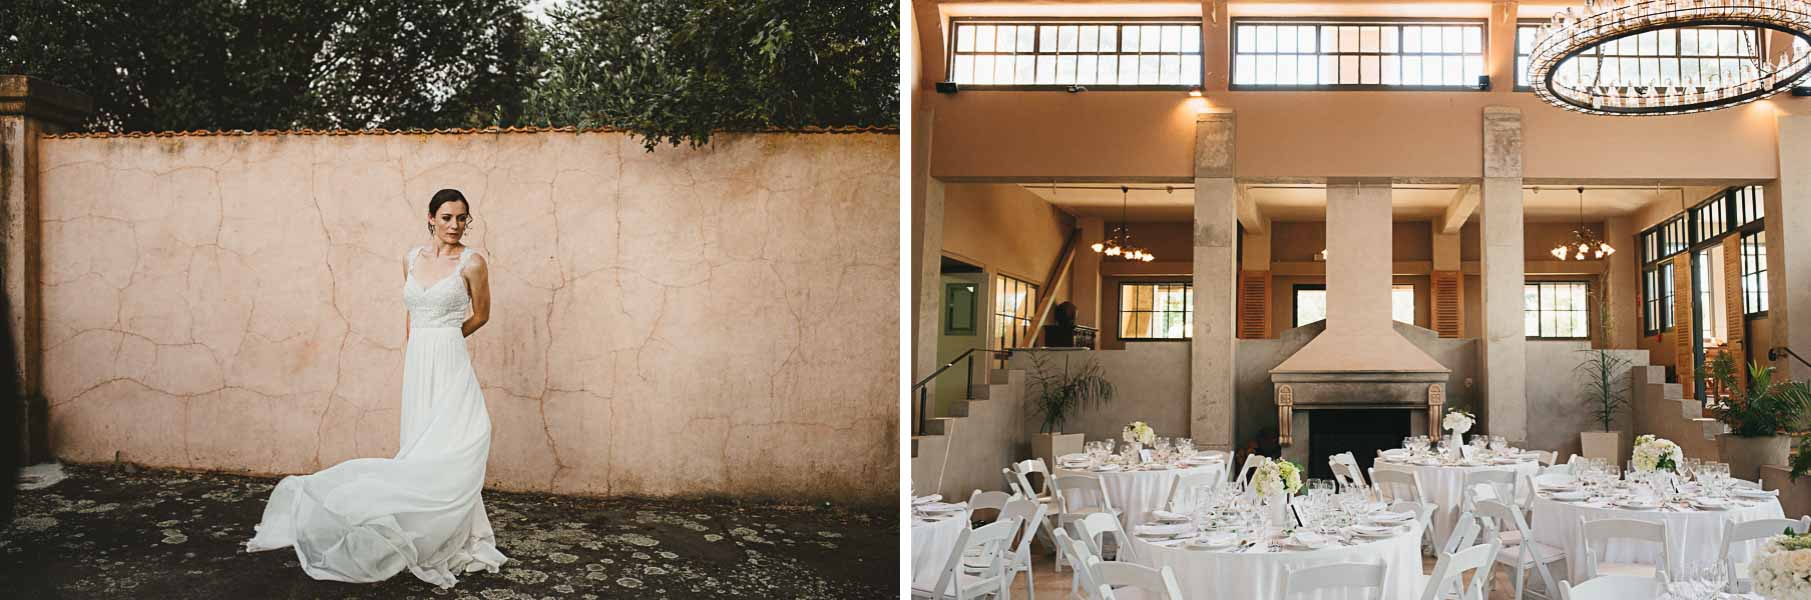 mediterranean wedding venue.jpg